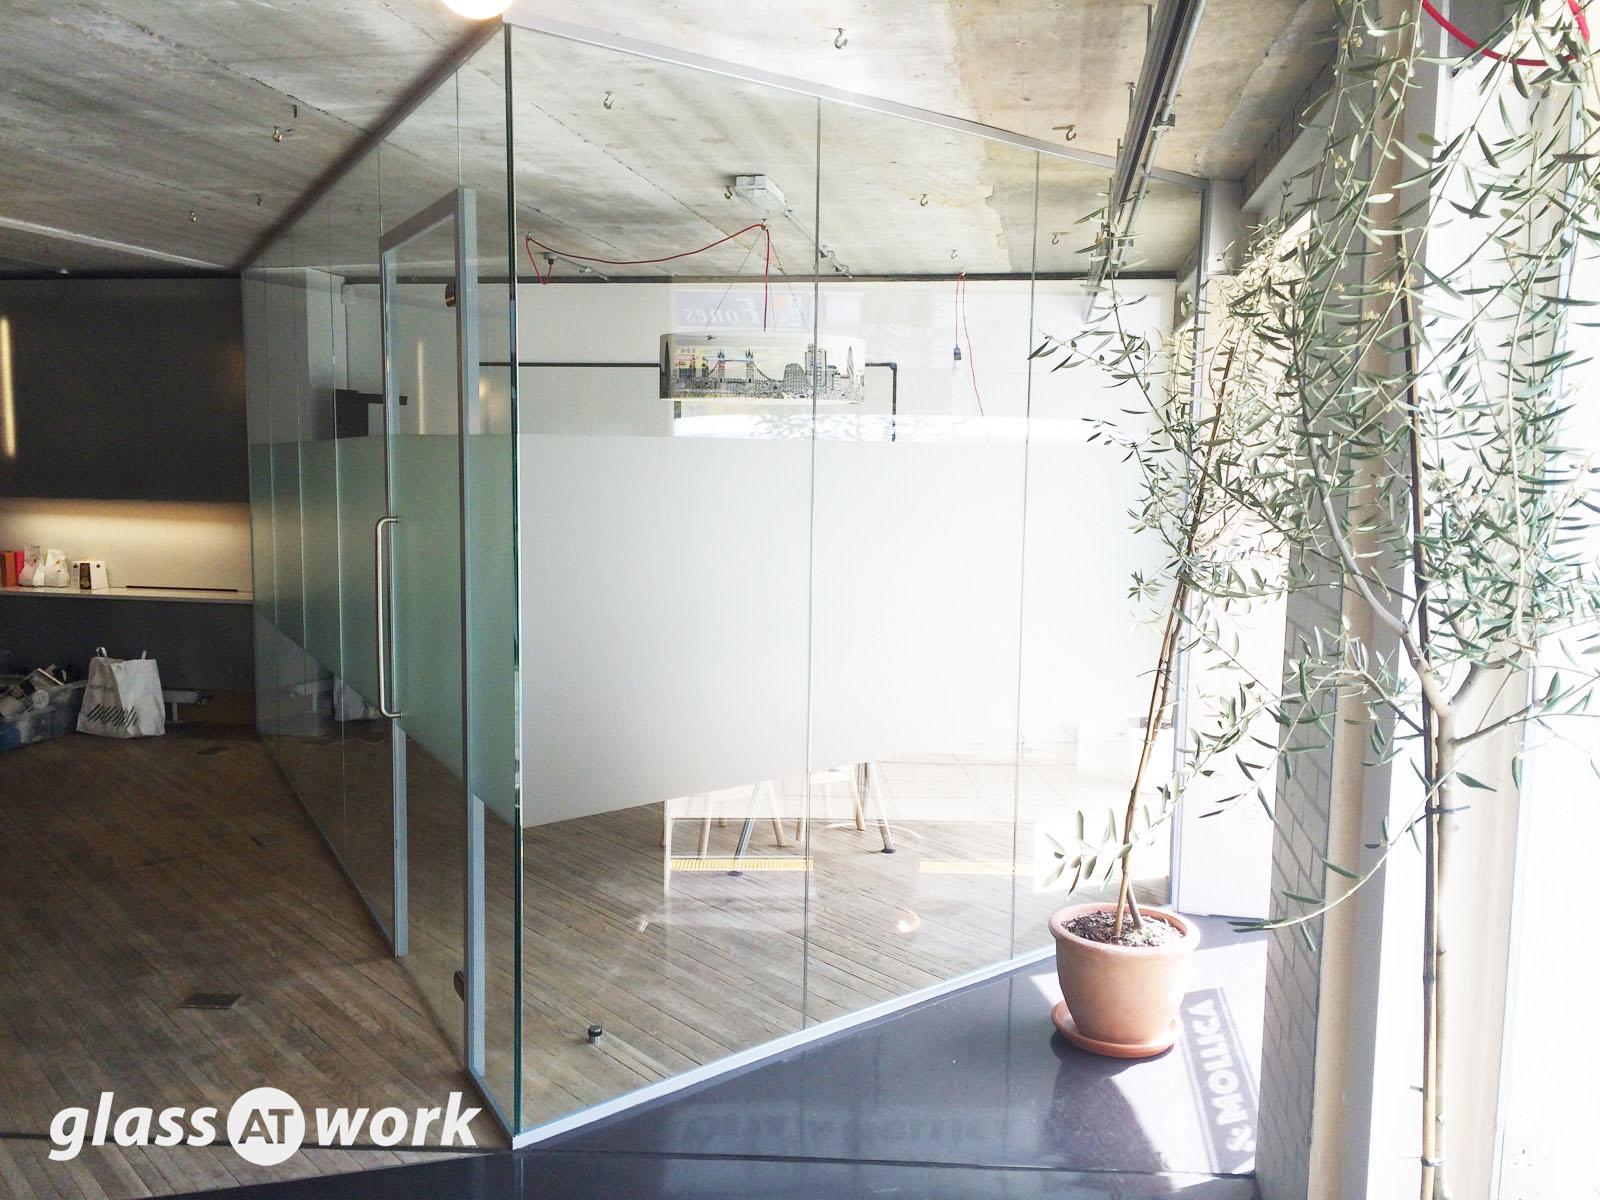 office glass door glazed. Office Glass Door Glazed